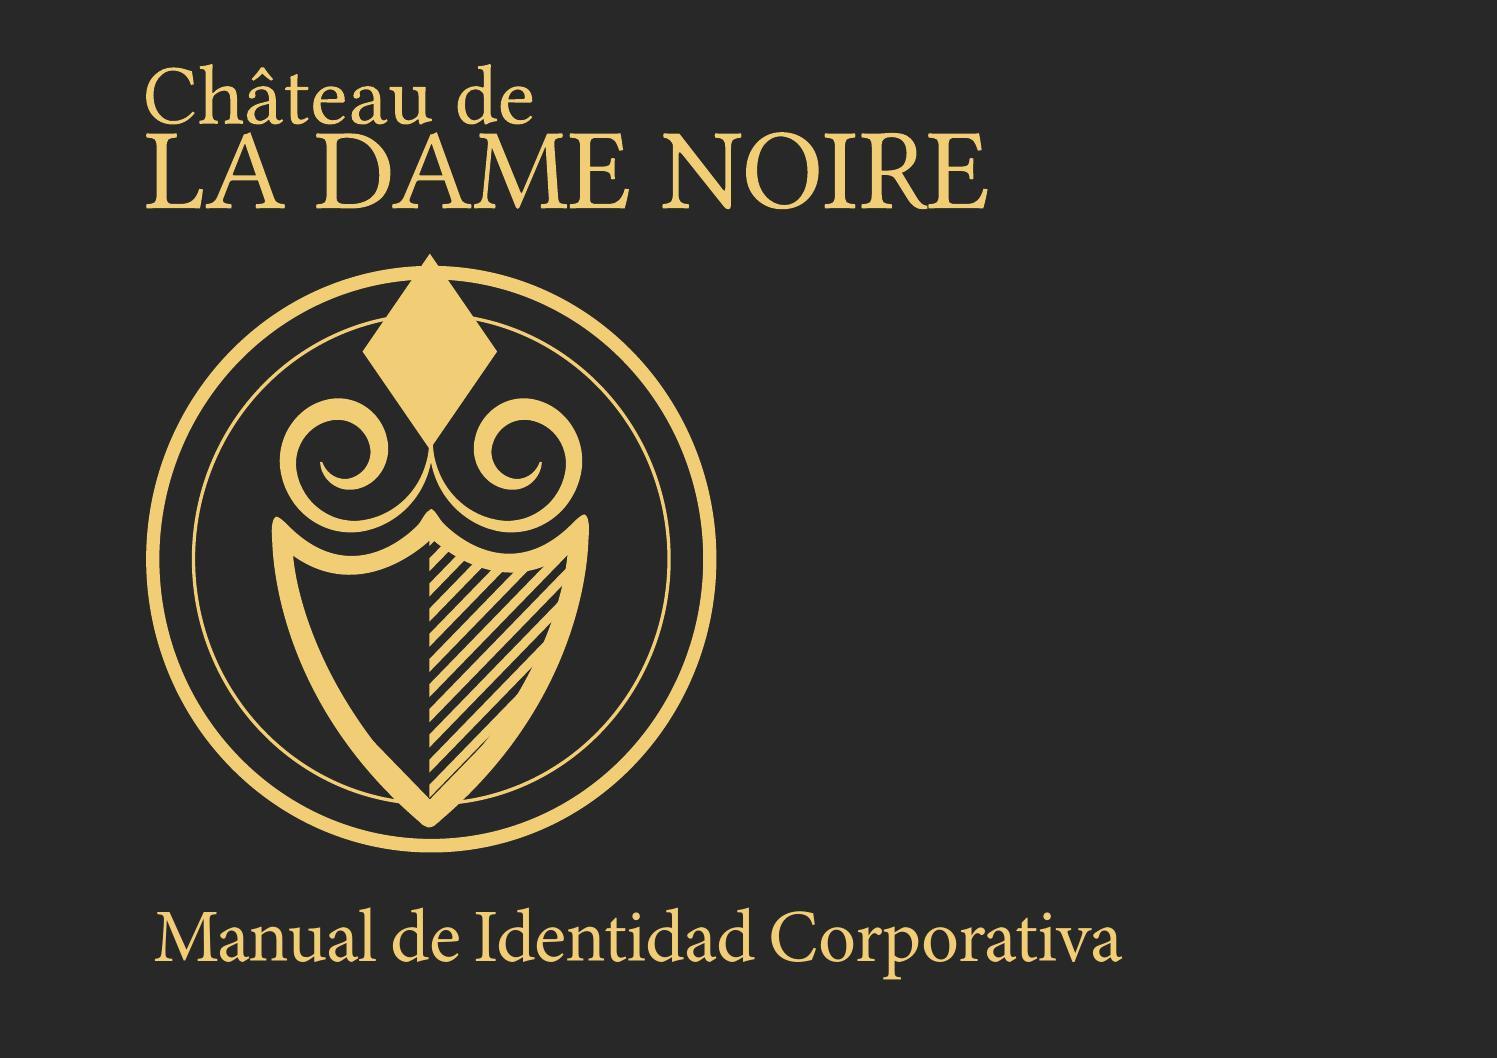 Manual de Identidad Corporativa Champagne Château de la Dame Noire